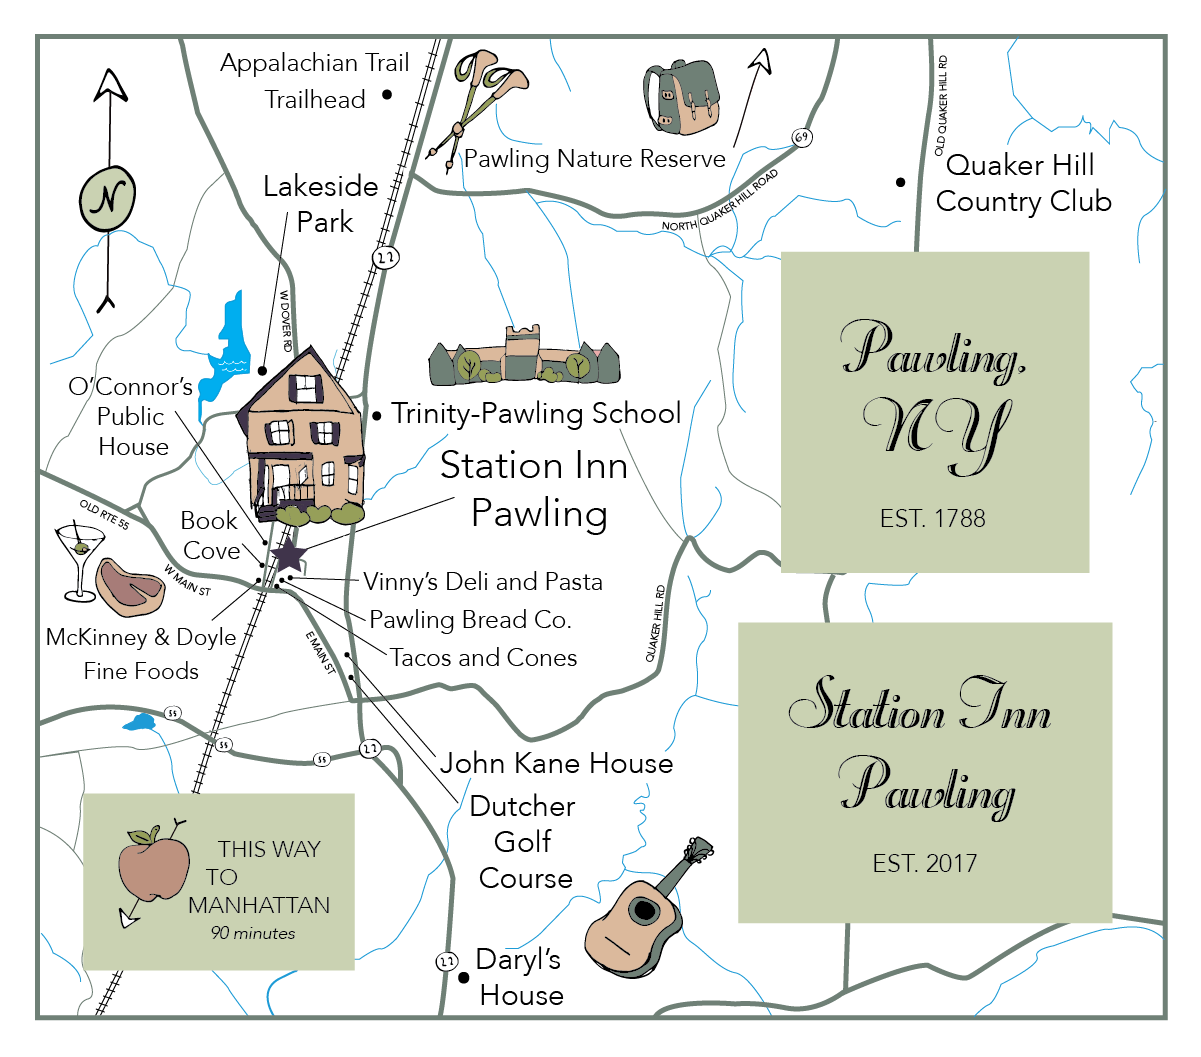 station inn map mckinney edit.png